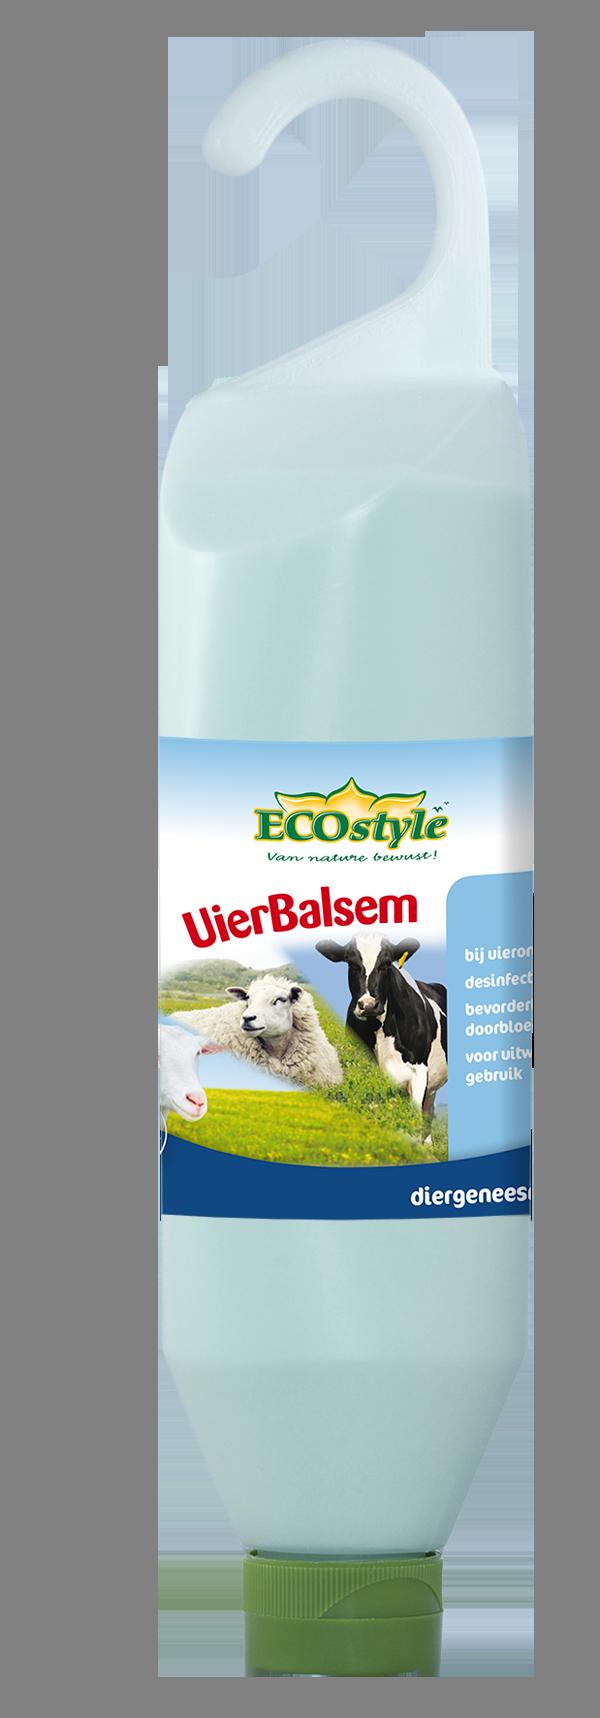 Uierbalsem Ecostyle 500 ml